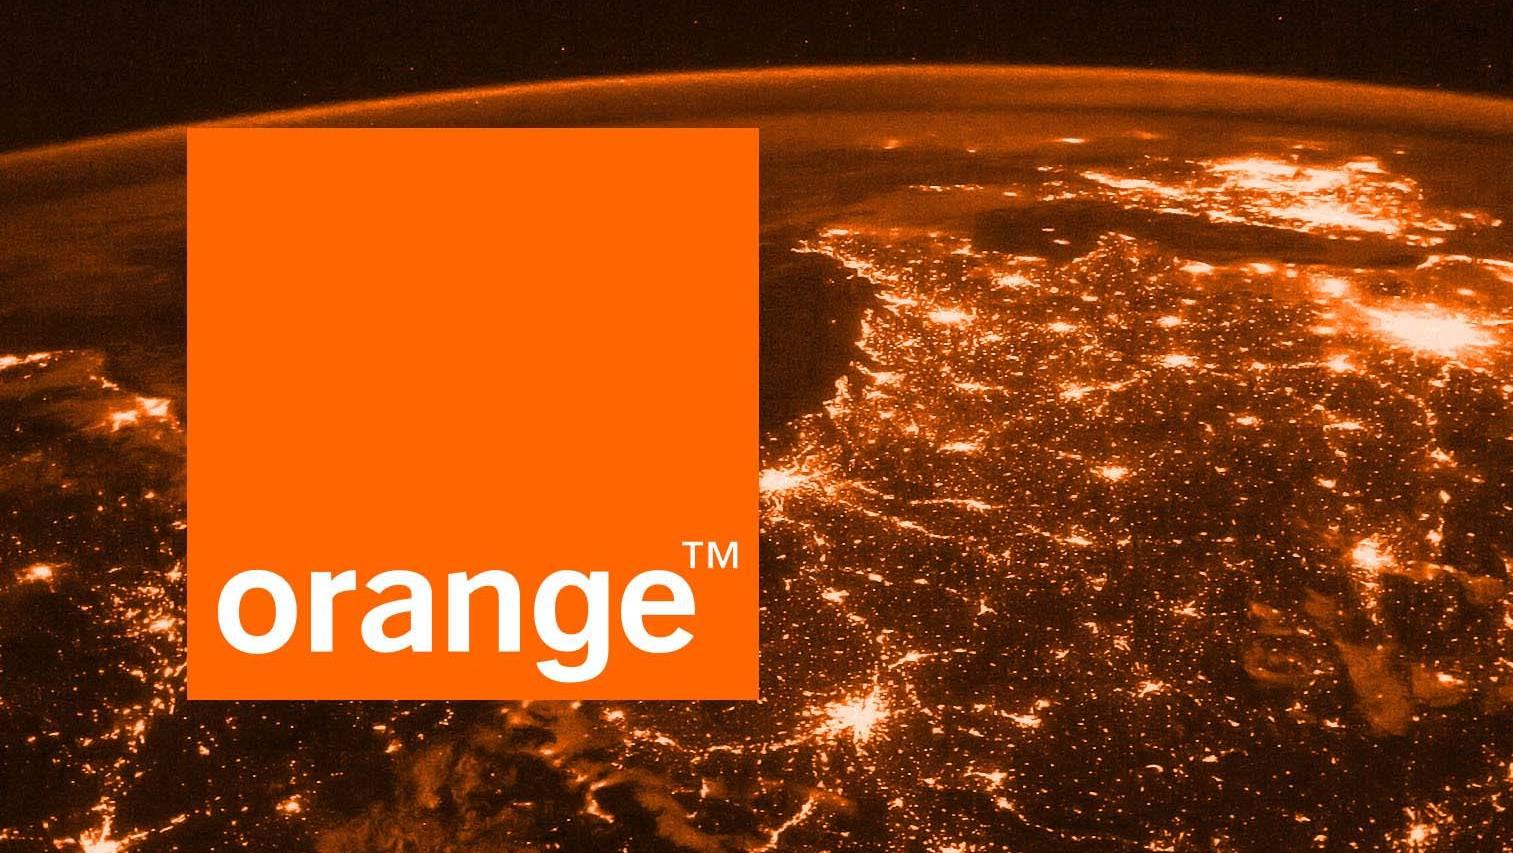 Orange Telefoanele PROMOTII 1 MAI Romania